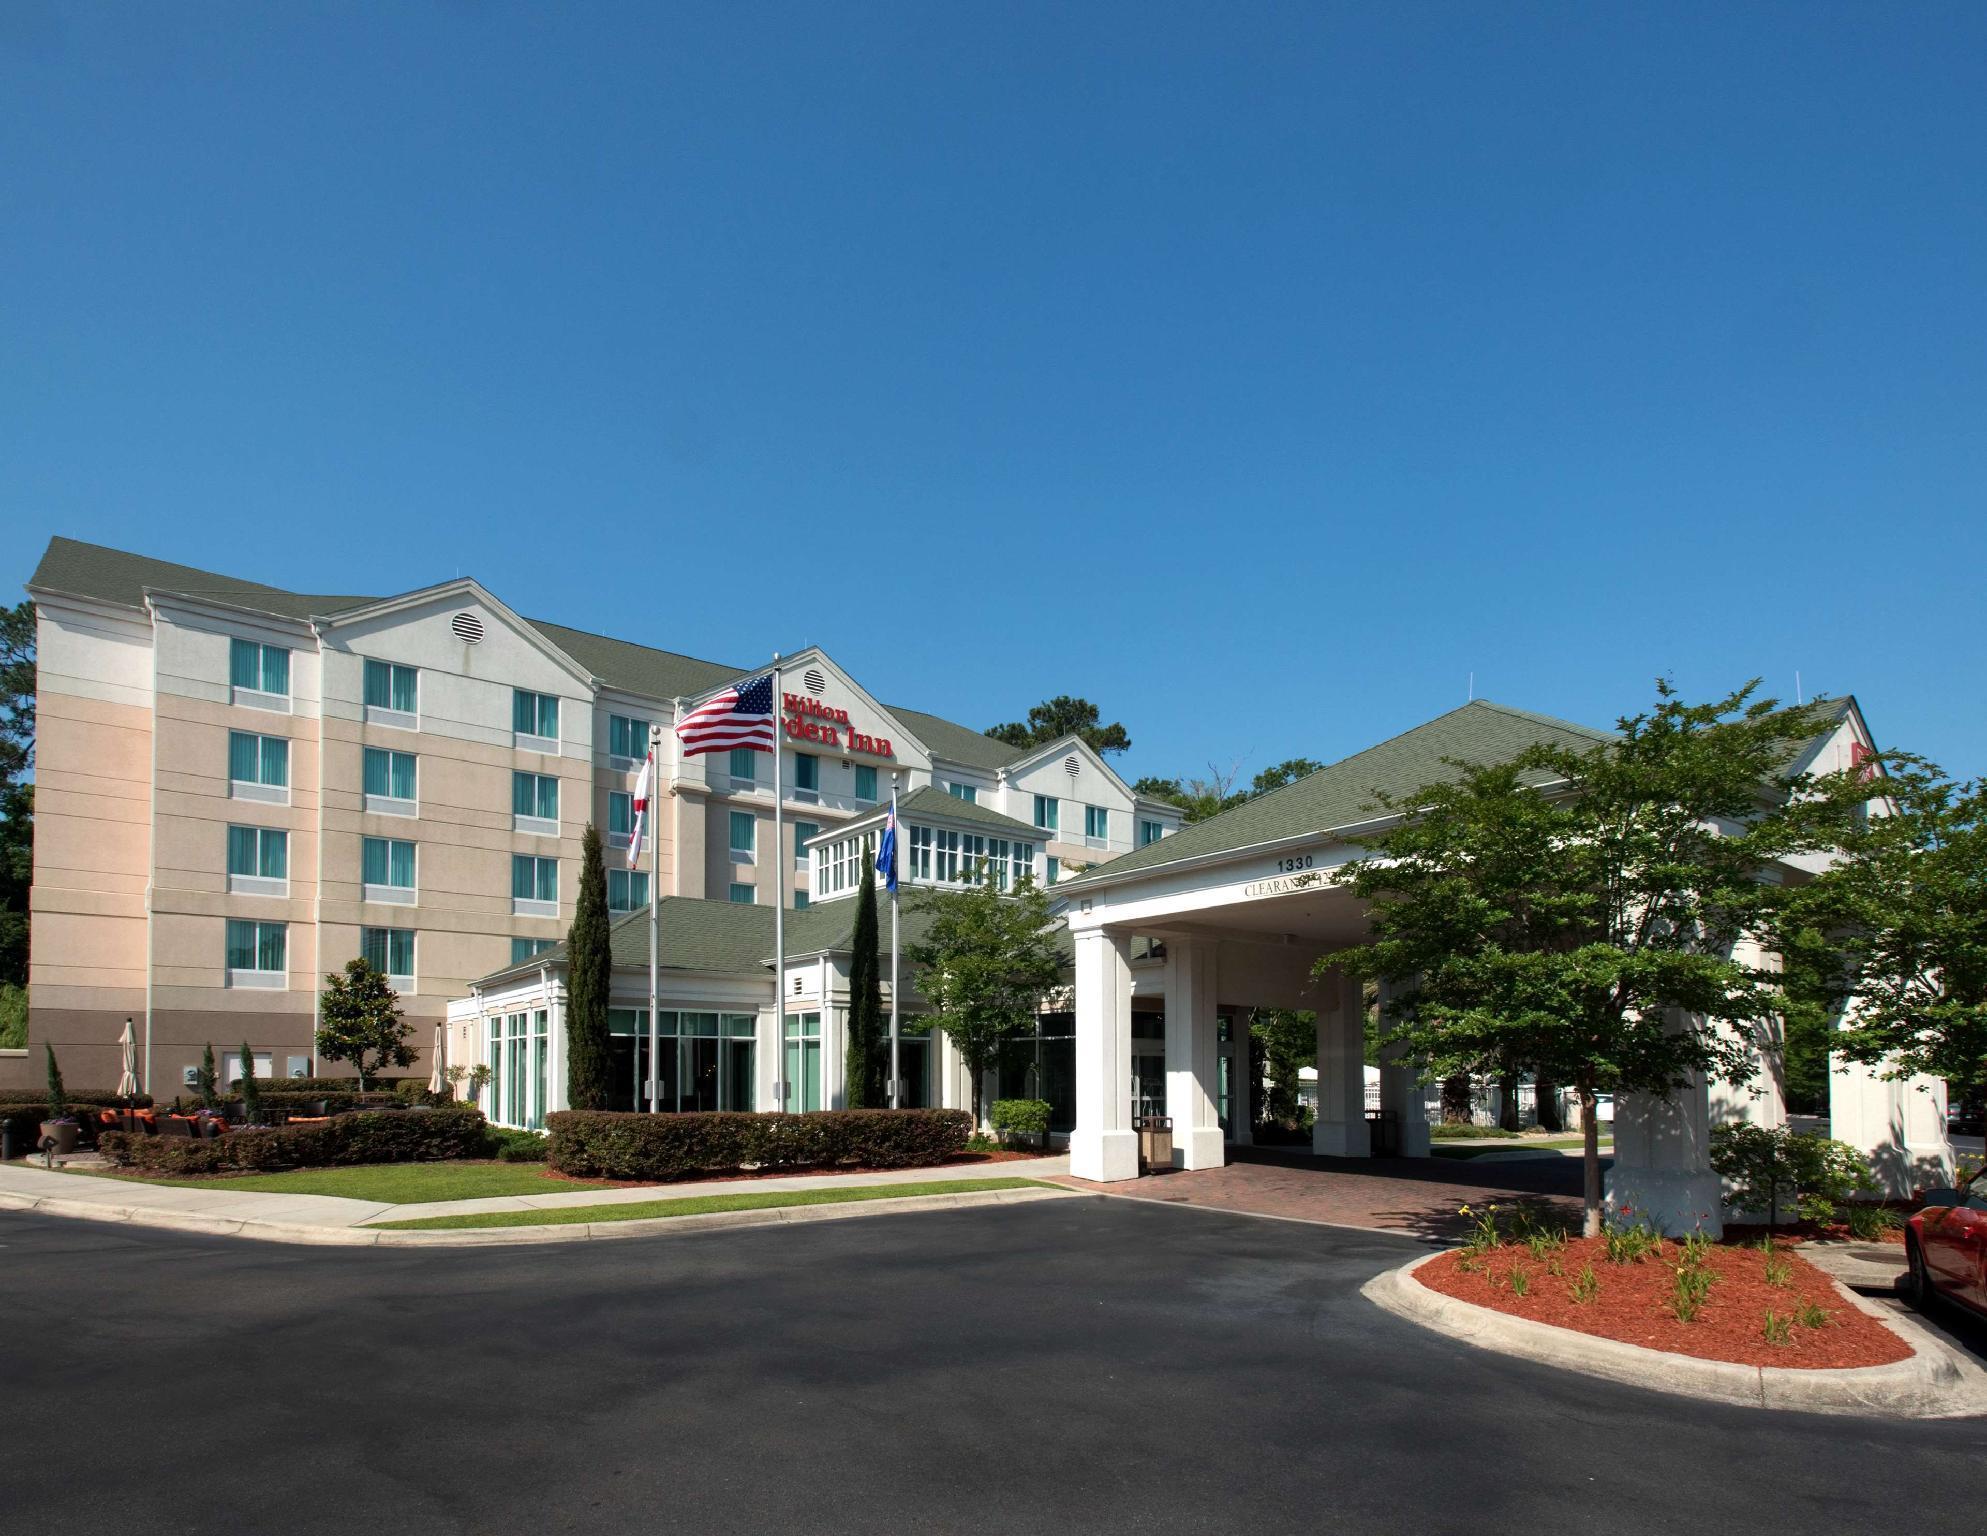 Hilton Garden Inn East Tallahassee Apalachee Pkwy